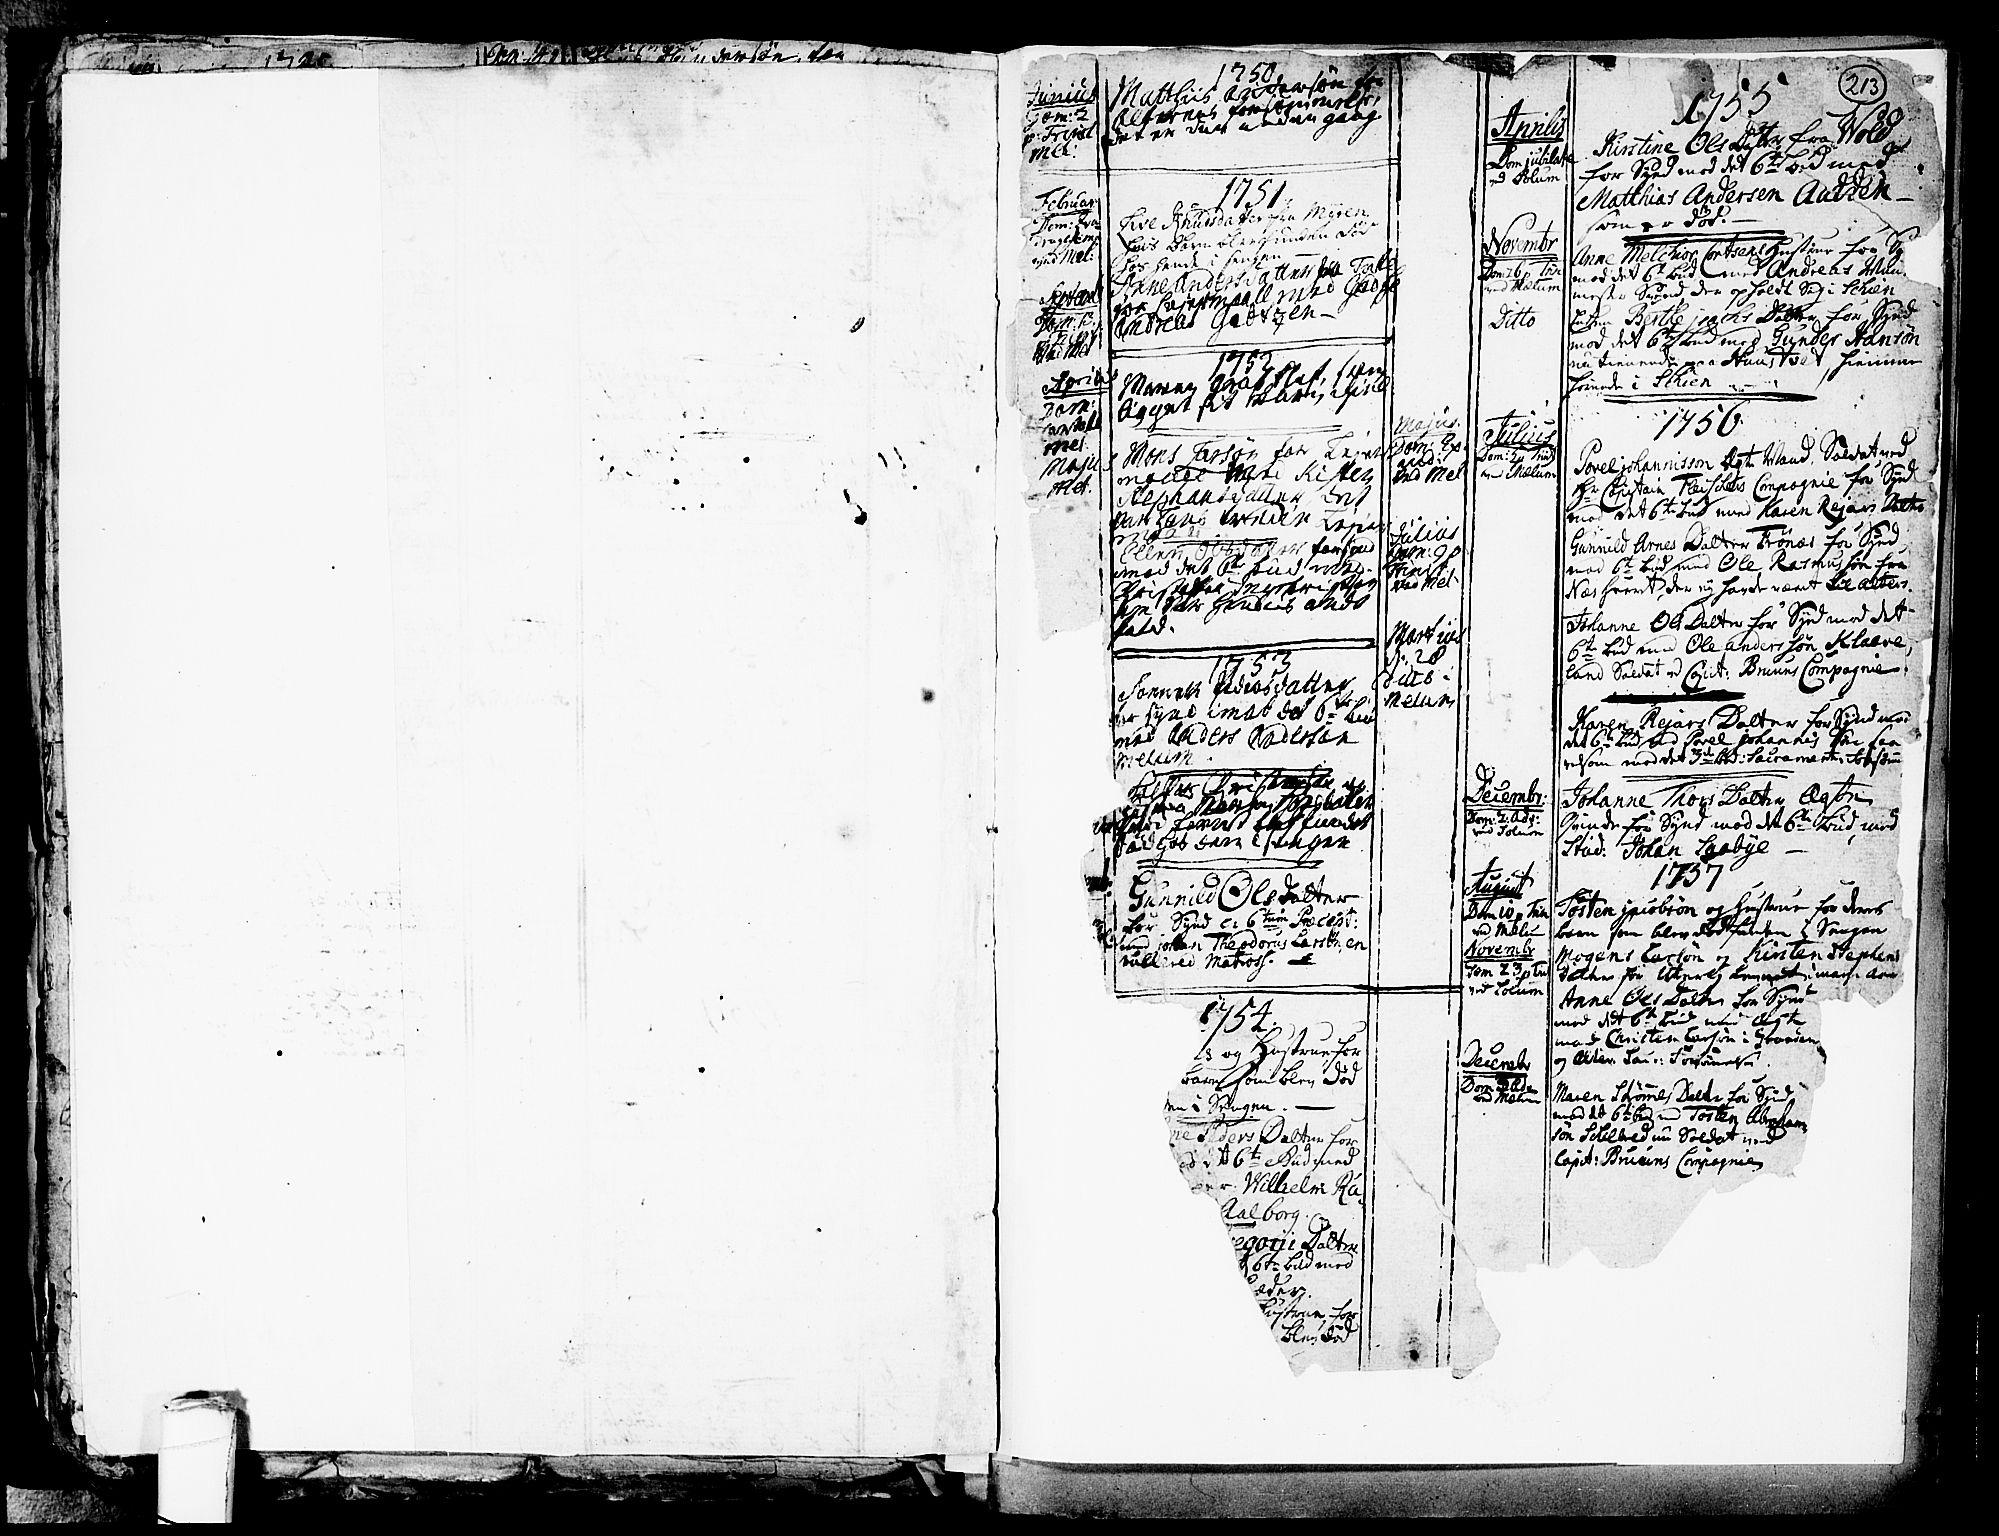 SAKO, Solum kirkebøker, F/Fa/L0002: Ministerialbok nr. I 2, 1713-1761, s. 213